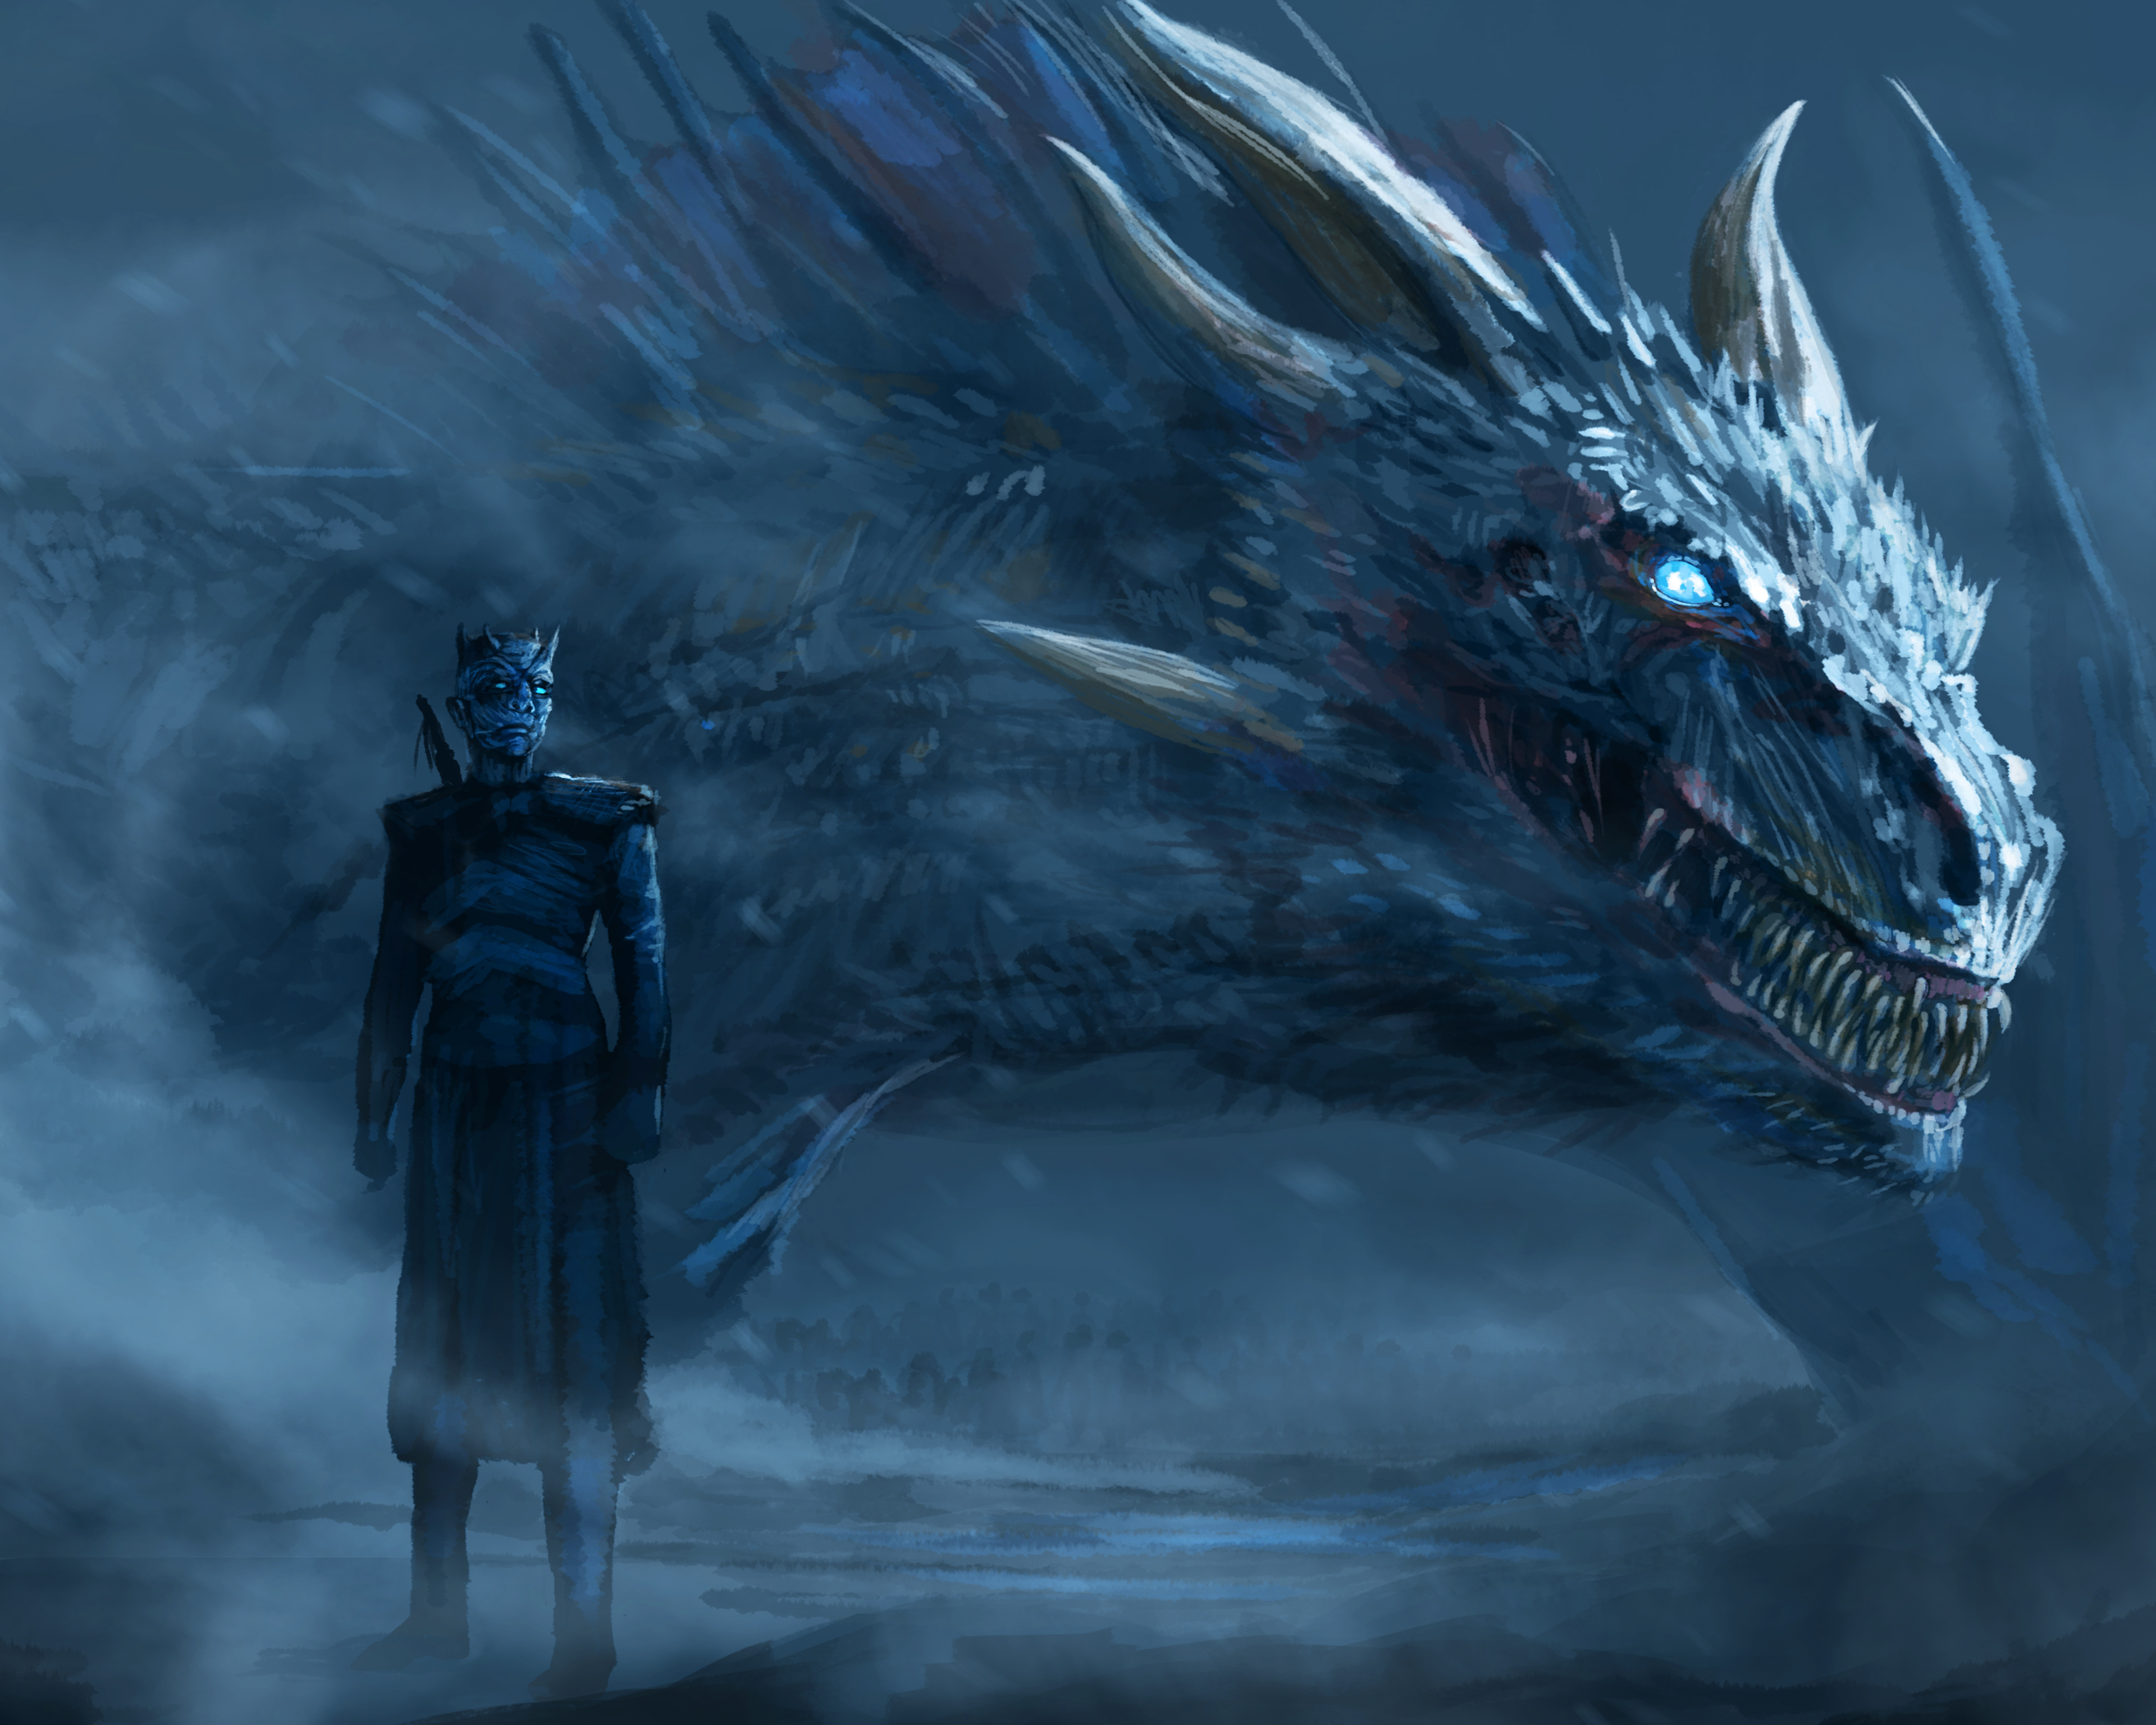 night king blue eyes white dragon hd tv shows 4k wallpapers